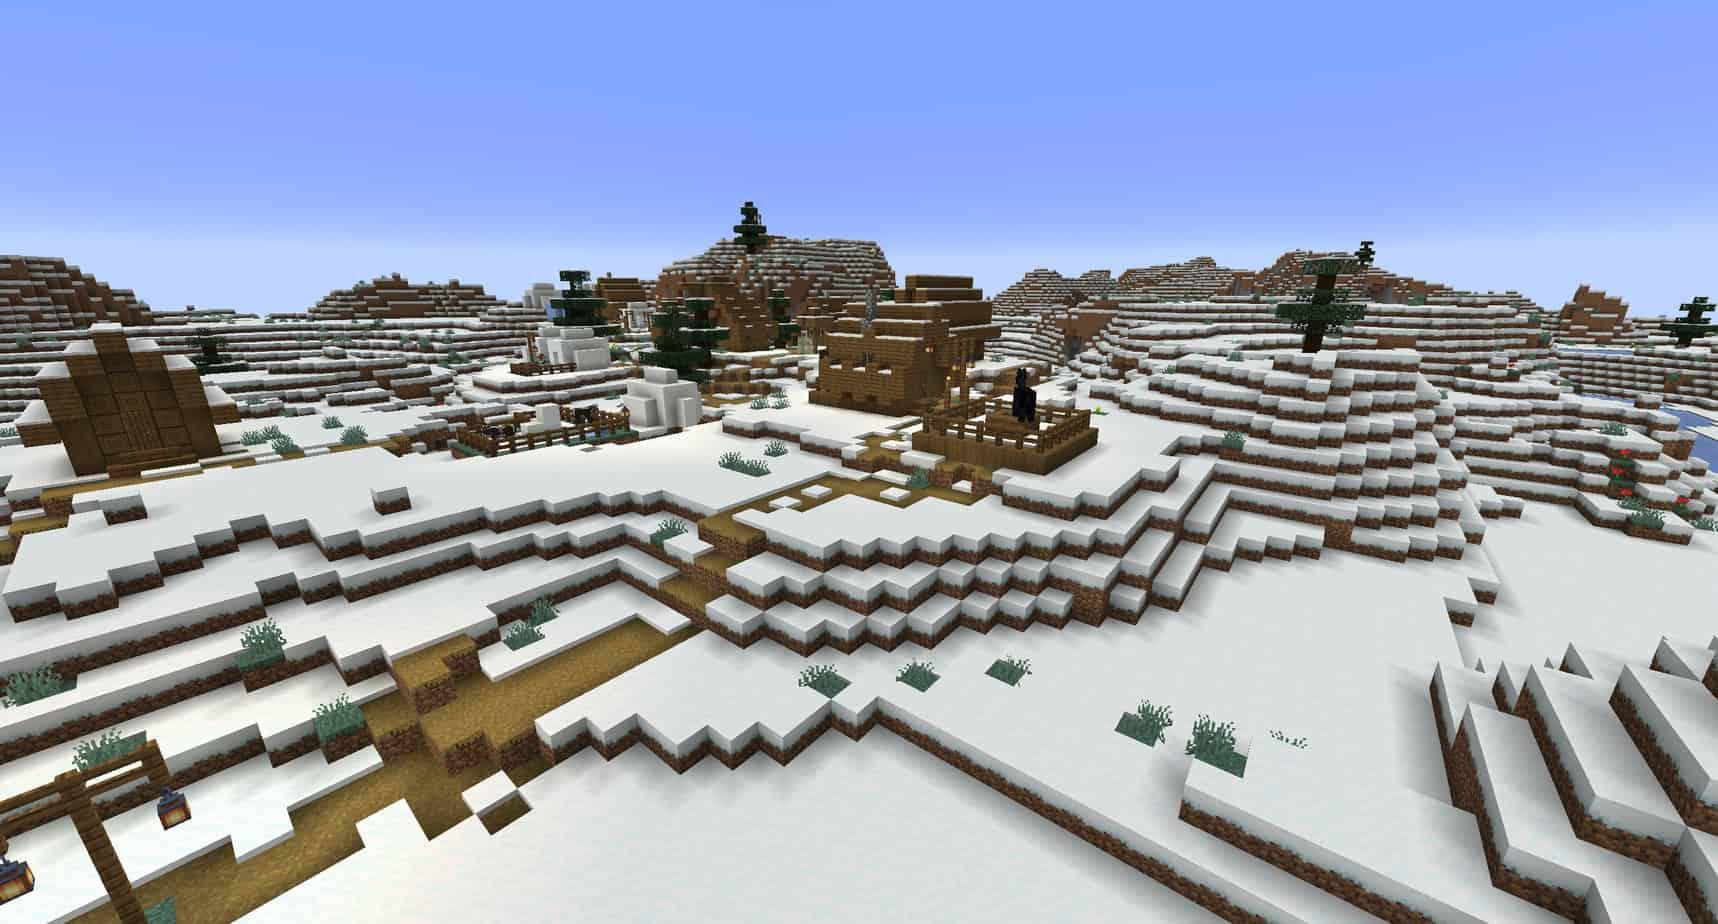 Minecraft Snowy Tundra